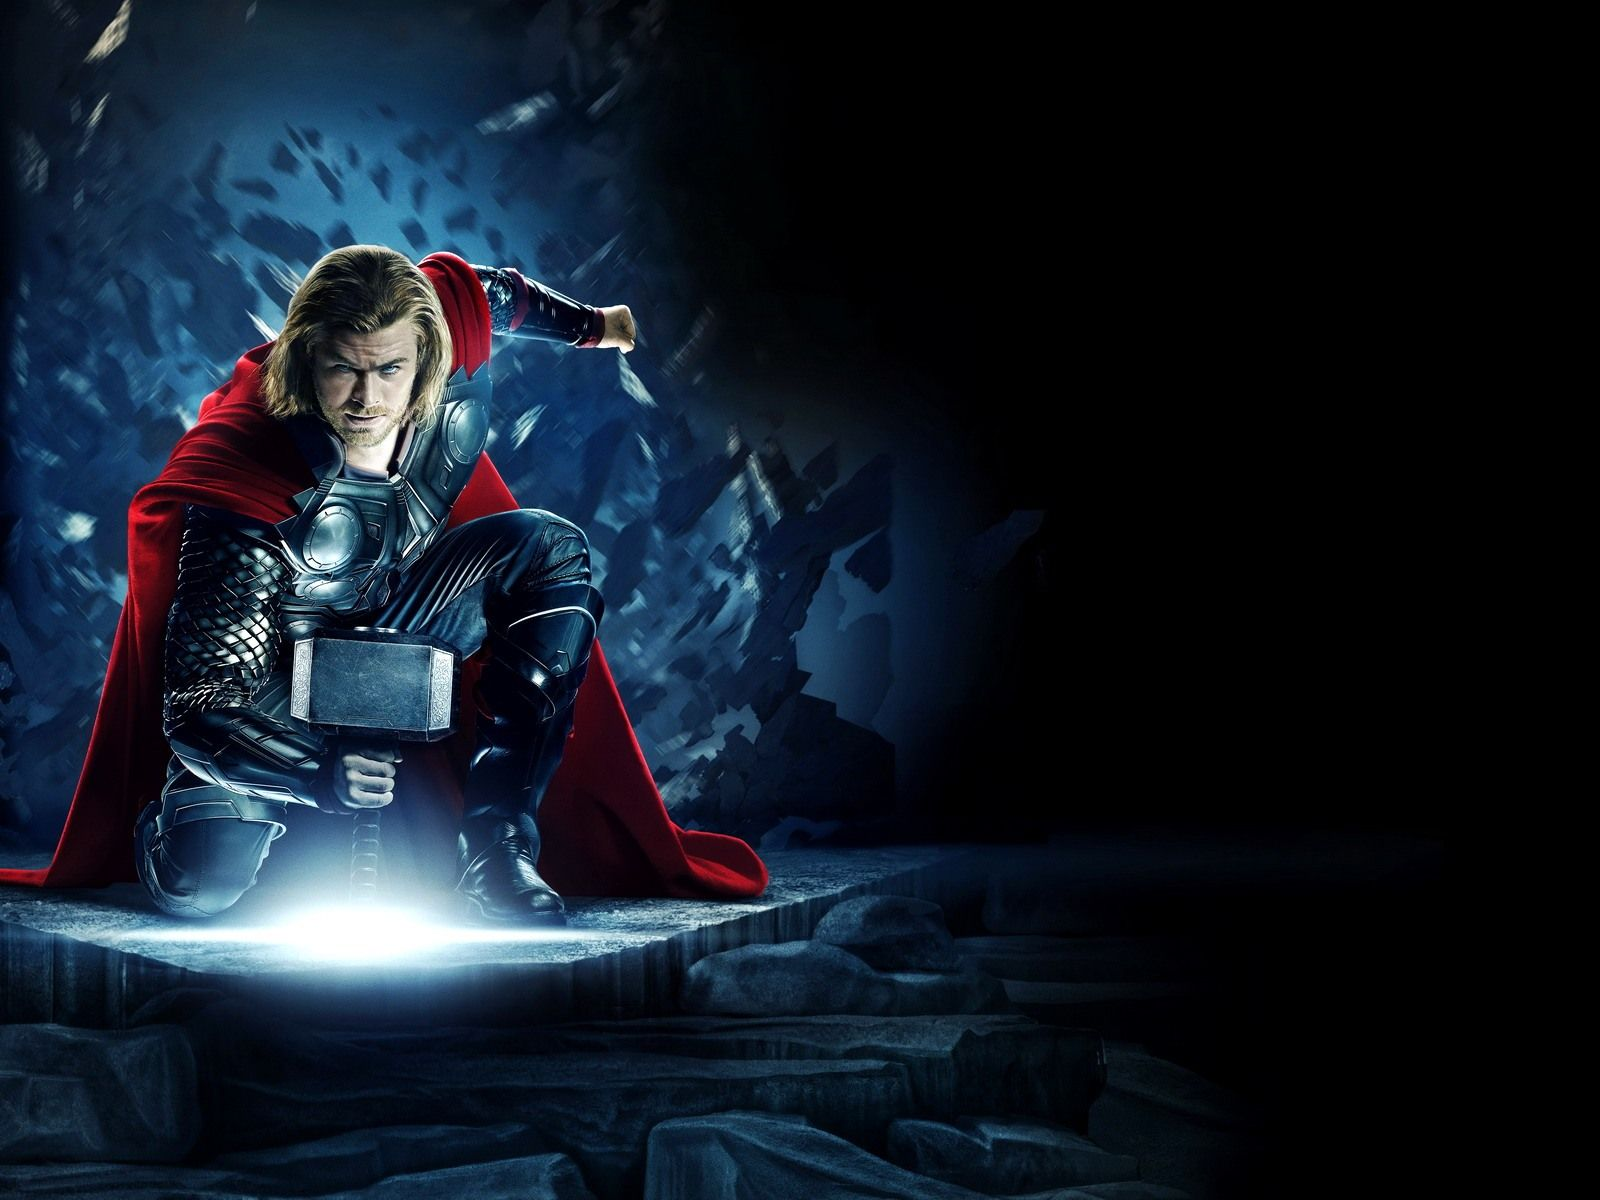 http://2.bp.blogspot.com/-1ntFAzKZAUo/UHb9DHUWRQI/AAAAAAAAAJE/VsVmB-v37GY/s1600/Thor-Wallpaper.jpg